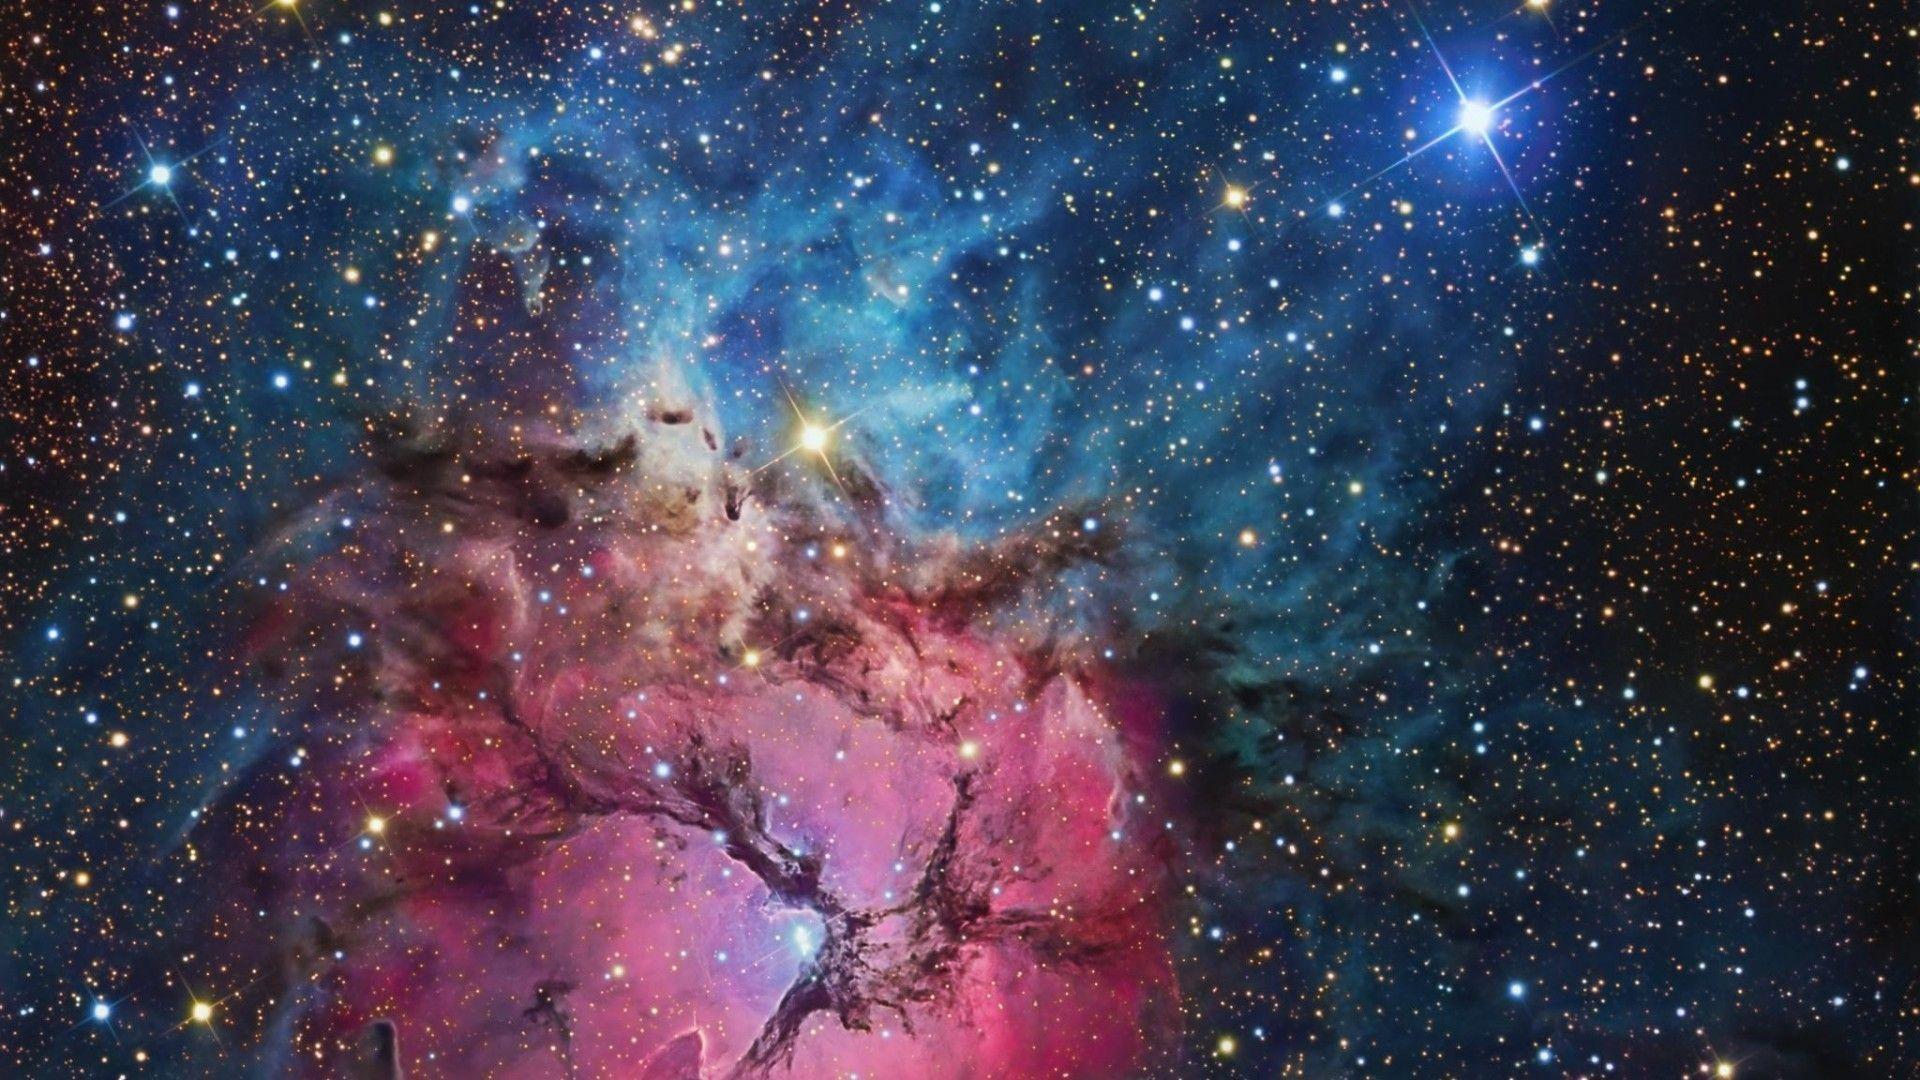 Wallpaper: Pin Desktop Wallpaper Hubble Space Telescope Picture On ..